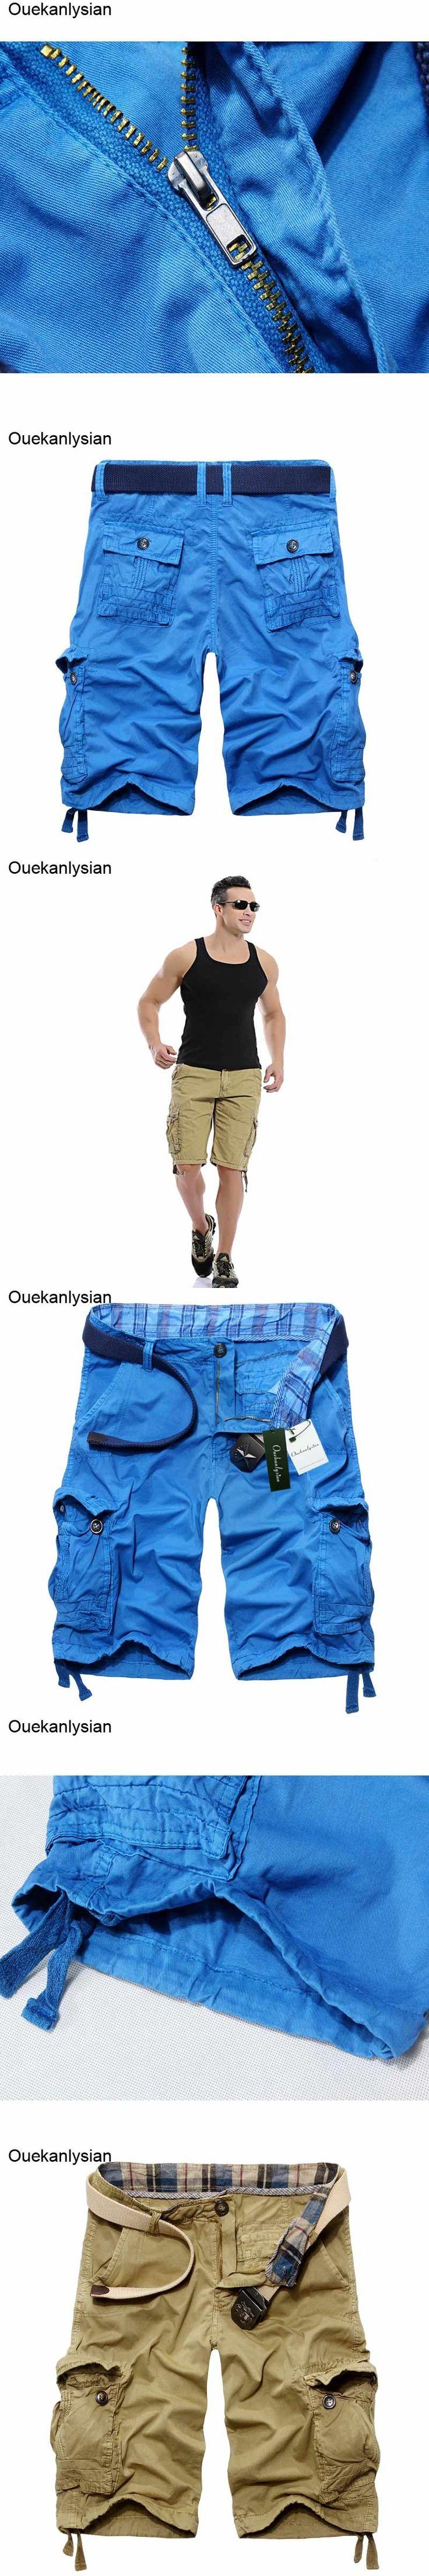 Ouekanlysian Military Homme Men Shorts Cotton Cargo Mid Waist Overalls Jogger Basquetball Army Beach Shorts Bermuda Masculina